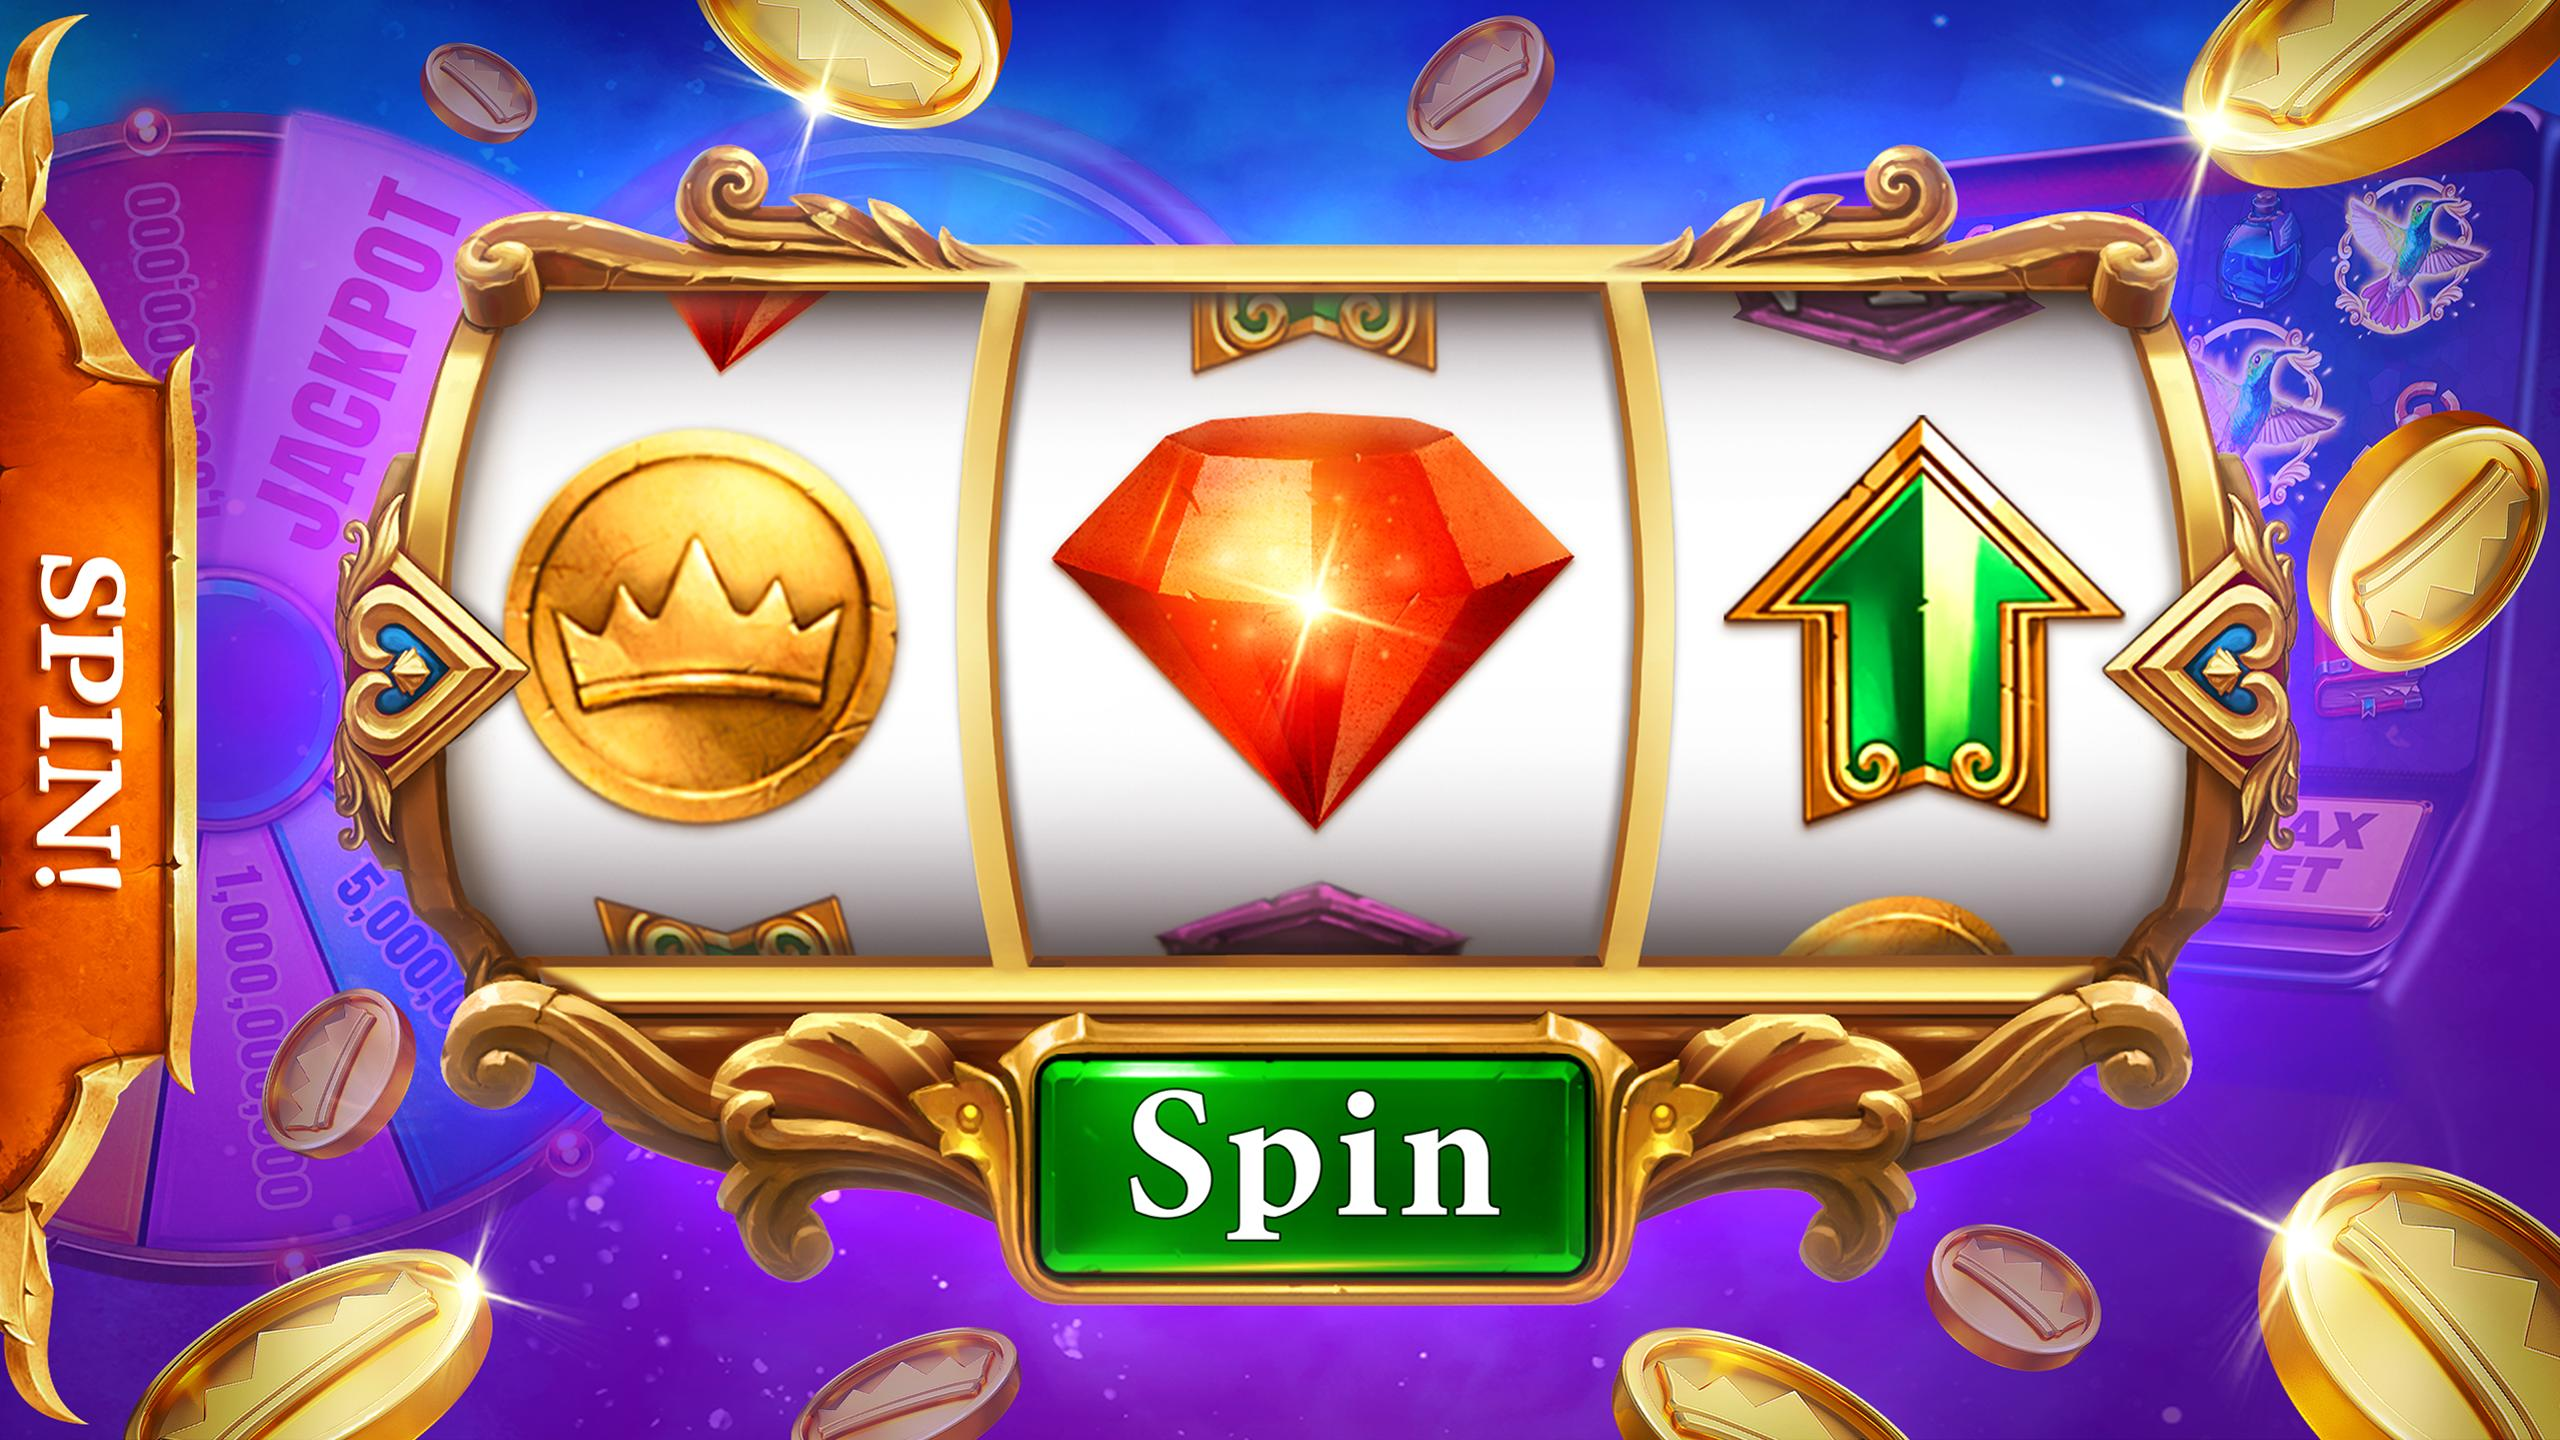 Scatter Slots Las Vegas Casino Game 777 Online 3.87.0 Screenshot 17